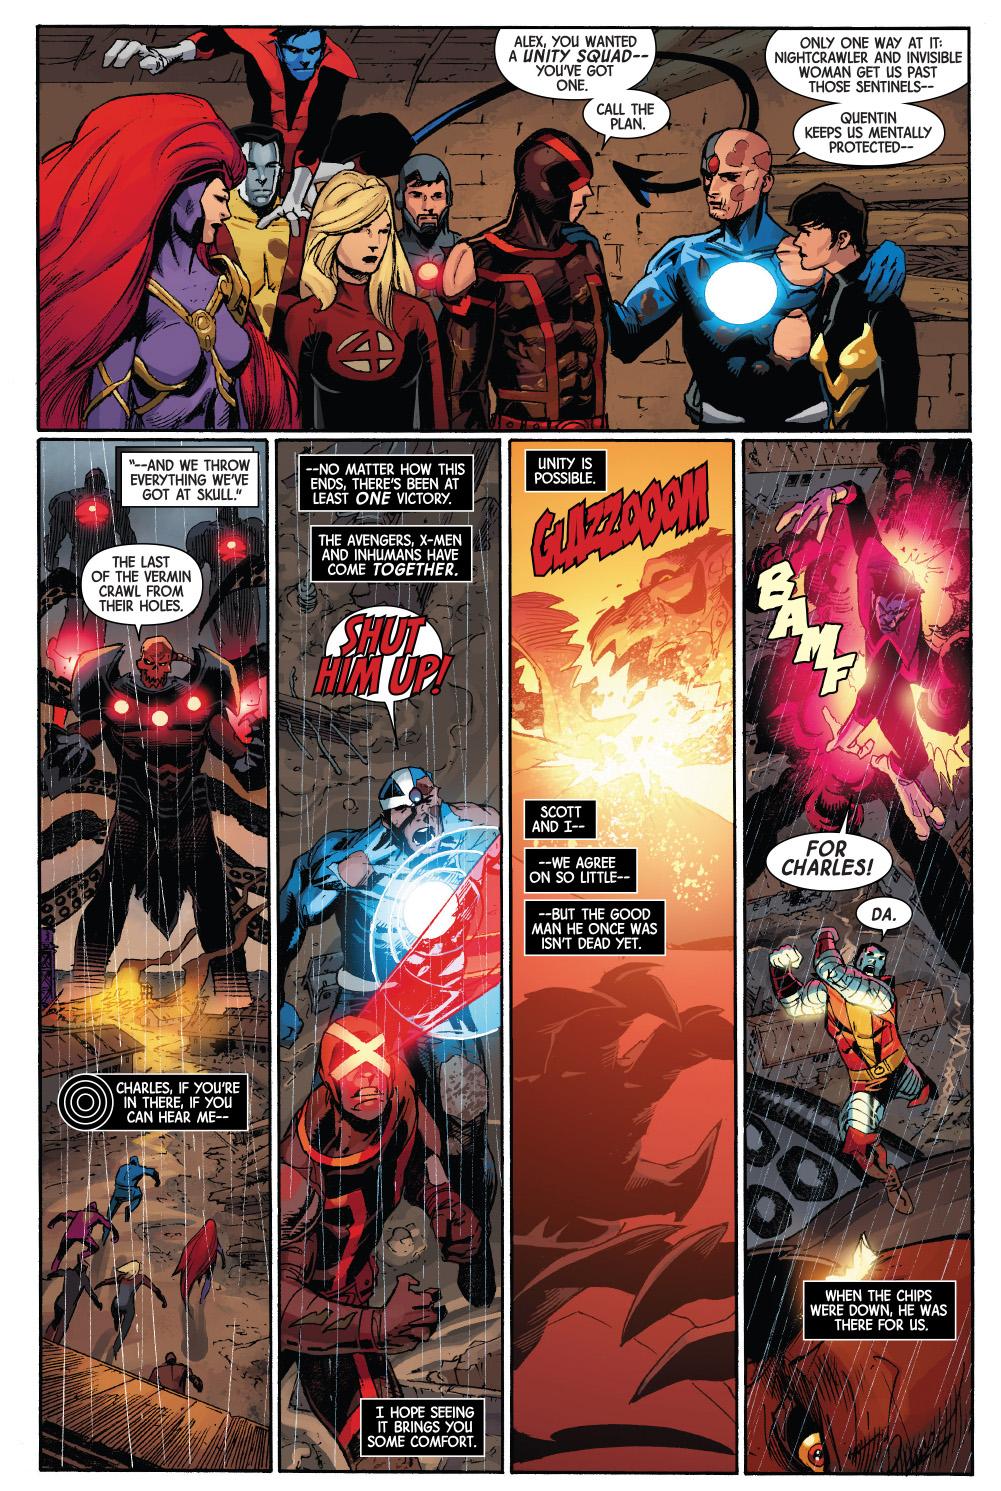 Cyclops And Havok Reconcile | Comicnewbies